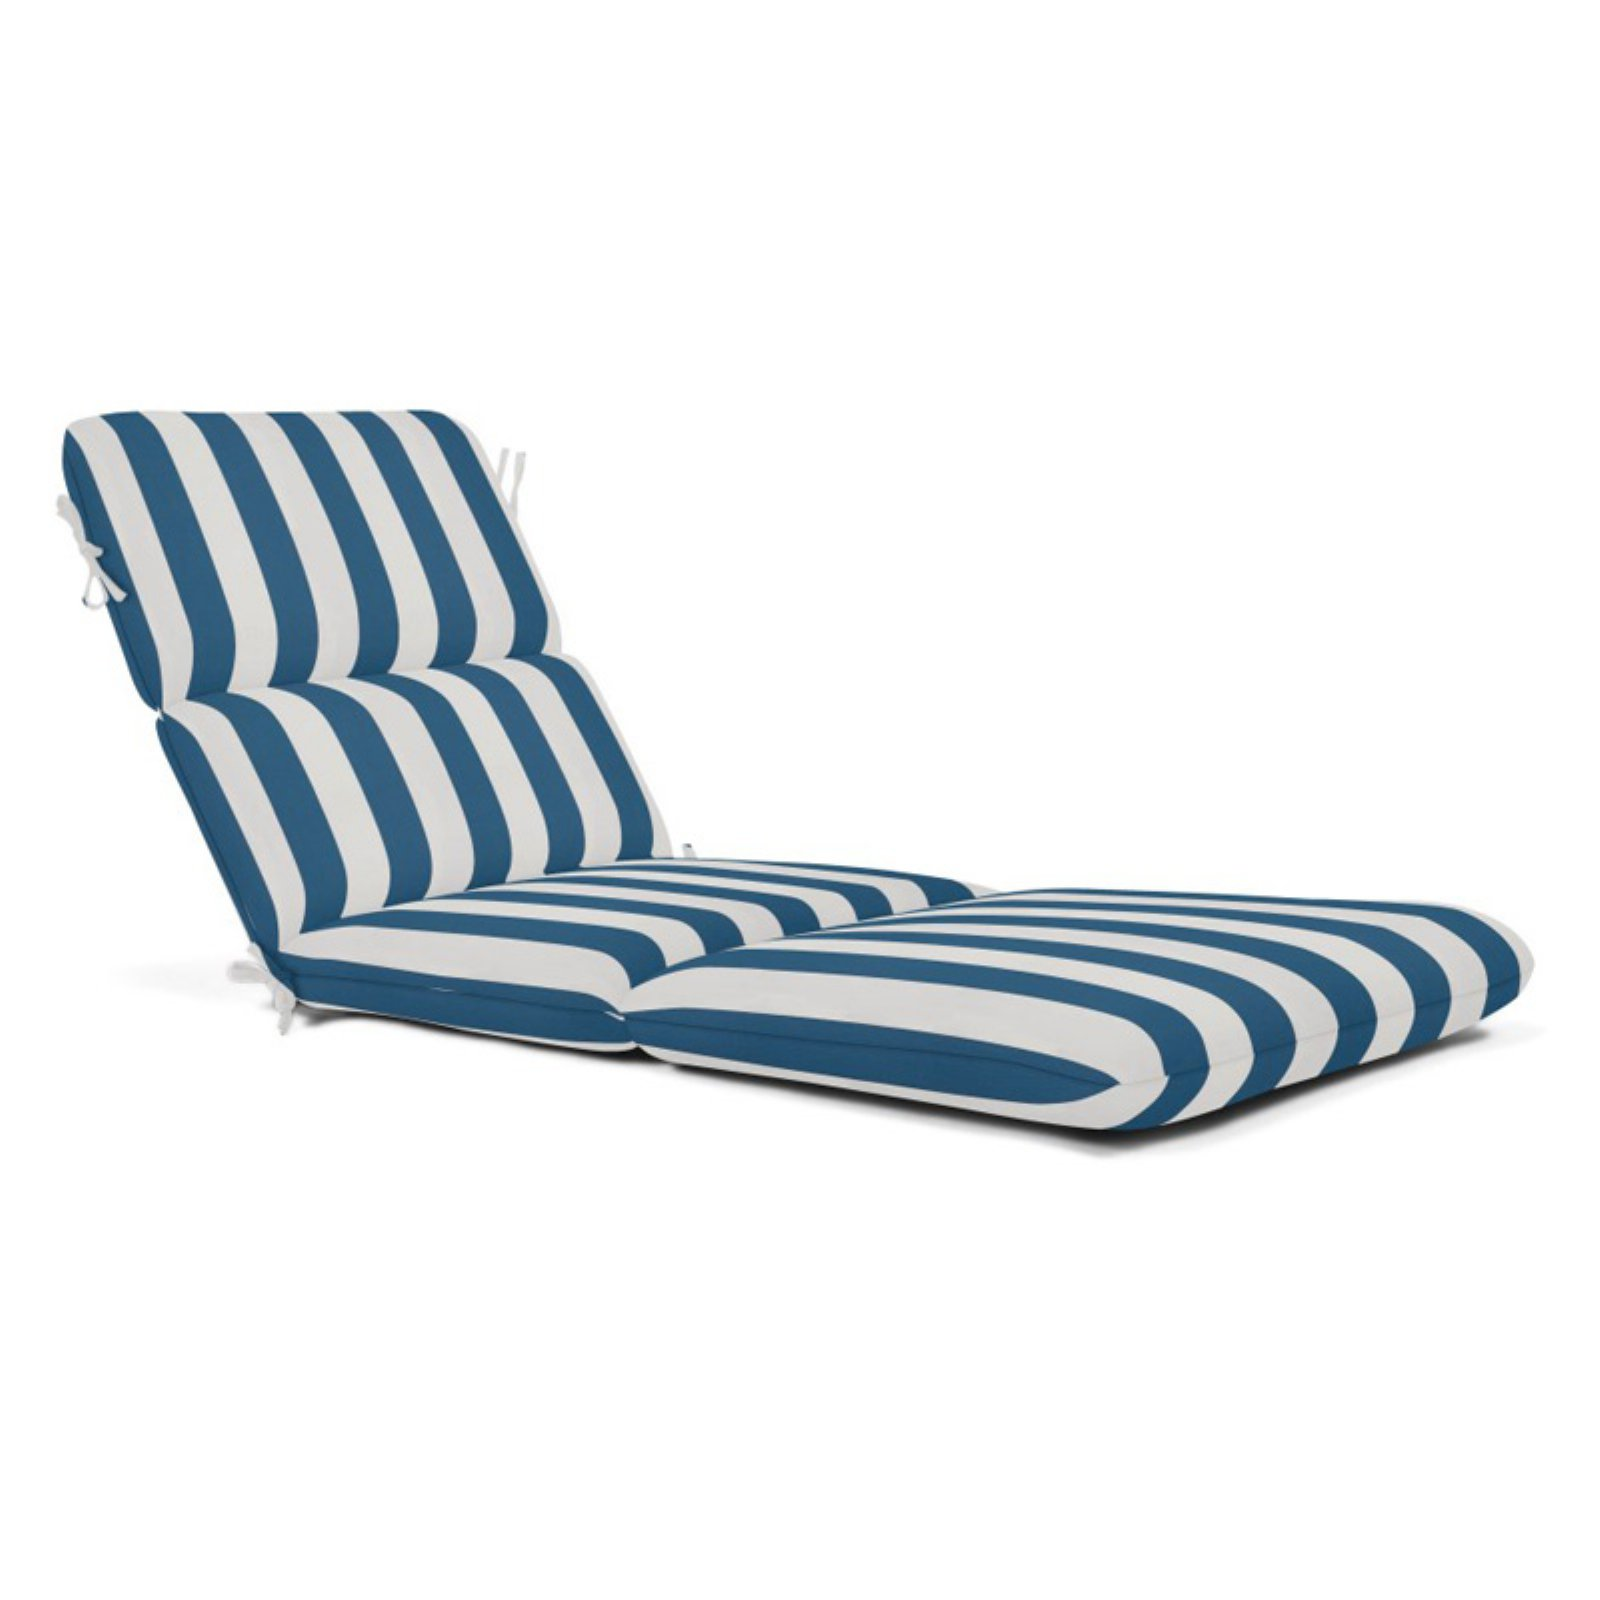 Sunbrella Striped Outdoor Chaise Cushion 74 x 22 in. - Maxim Regatta